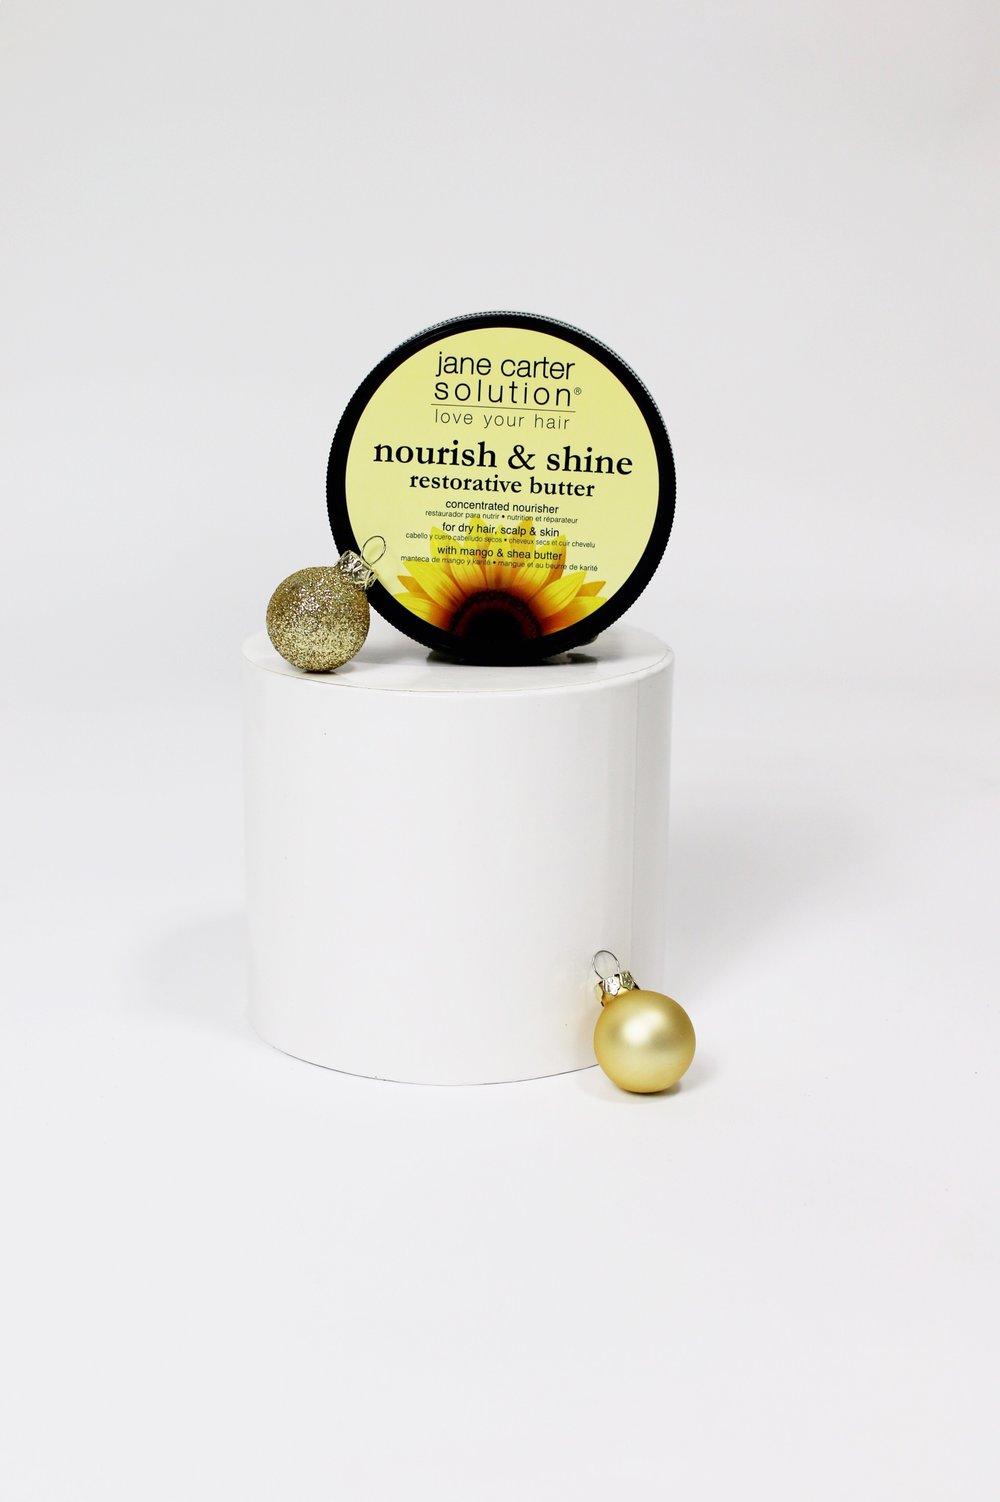 nourish and shine + jane carter